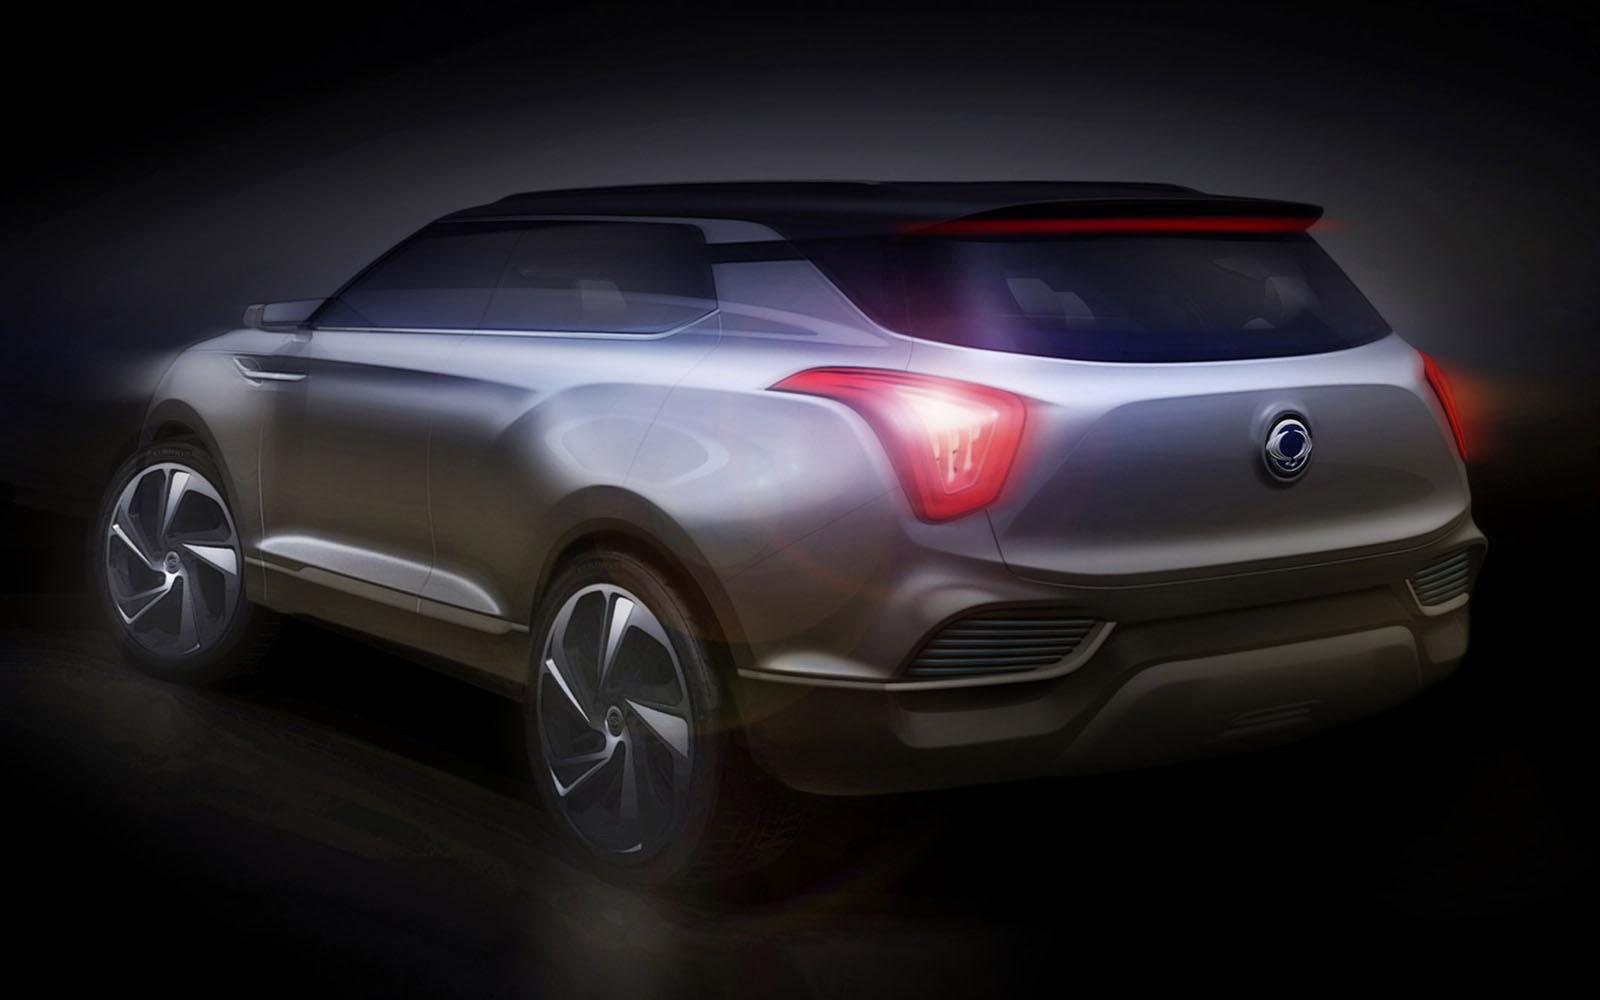 SsangYong XLV Concept 2014 Rear FrontSeatDriver.co.uk